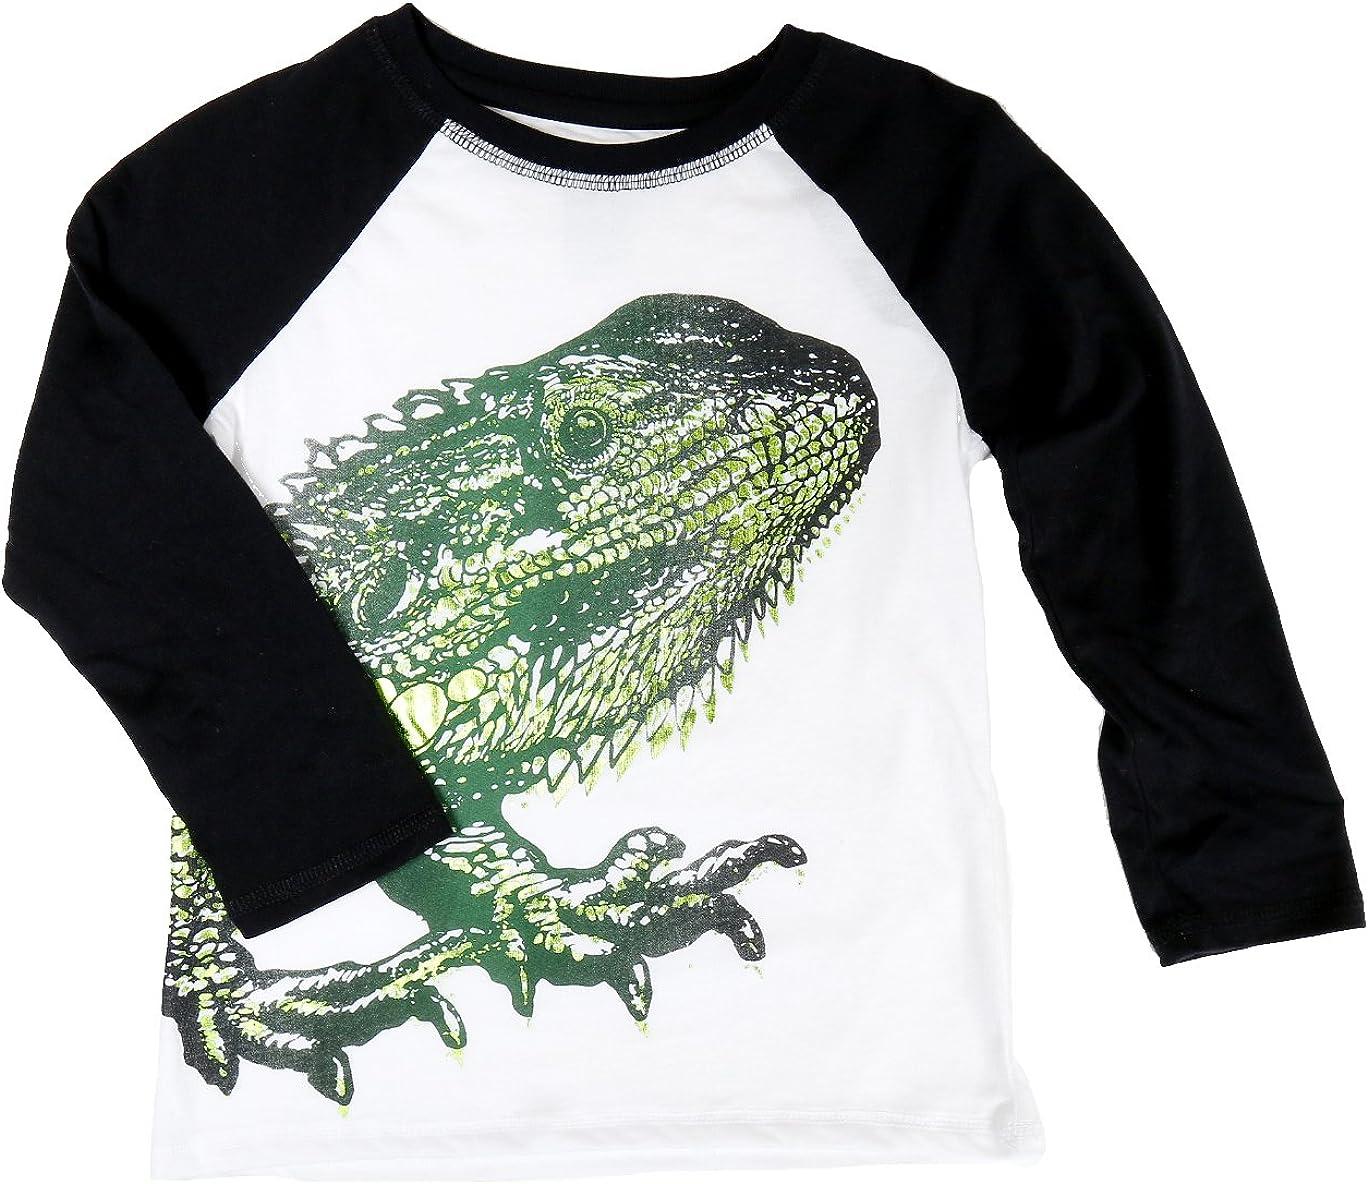 Epic Threads Graphic-Print Long-Sleeve T-Shirt, Little Boys (6 44-47 42-47lbs)